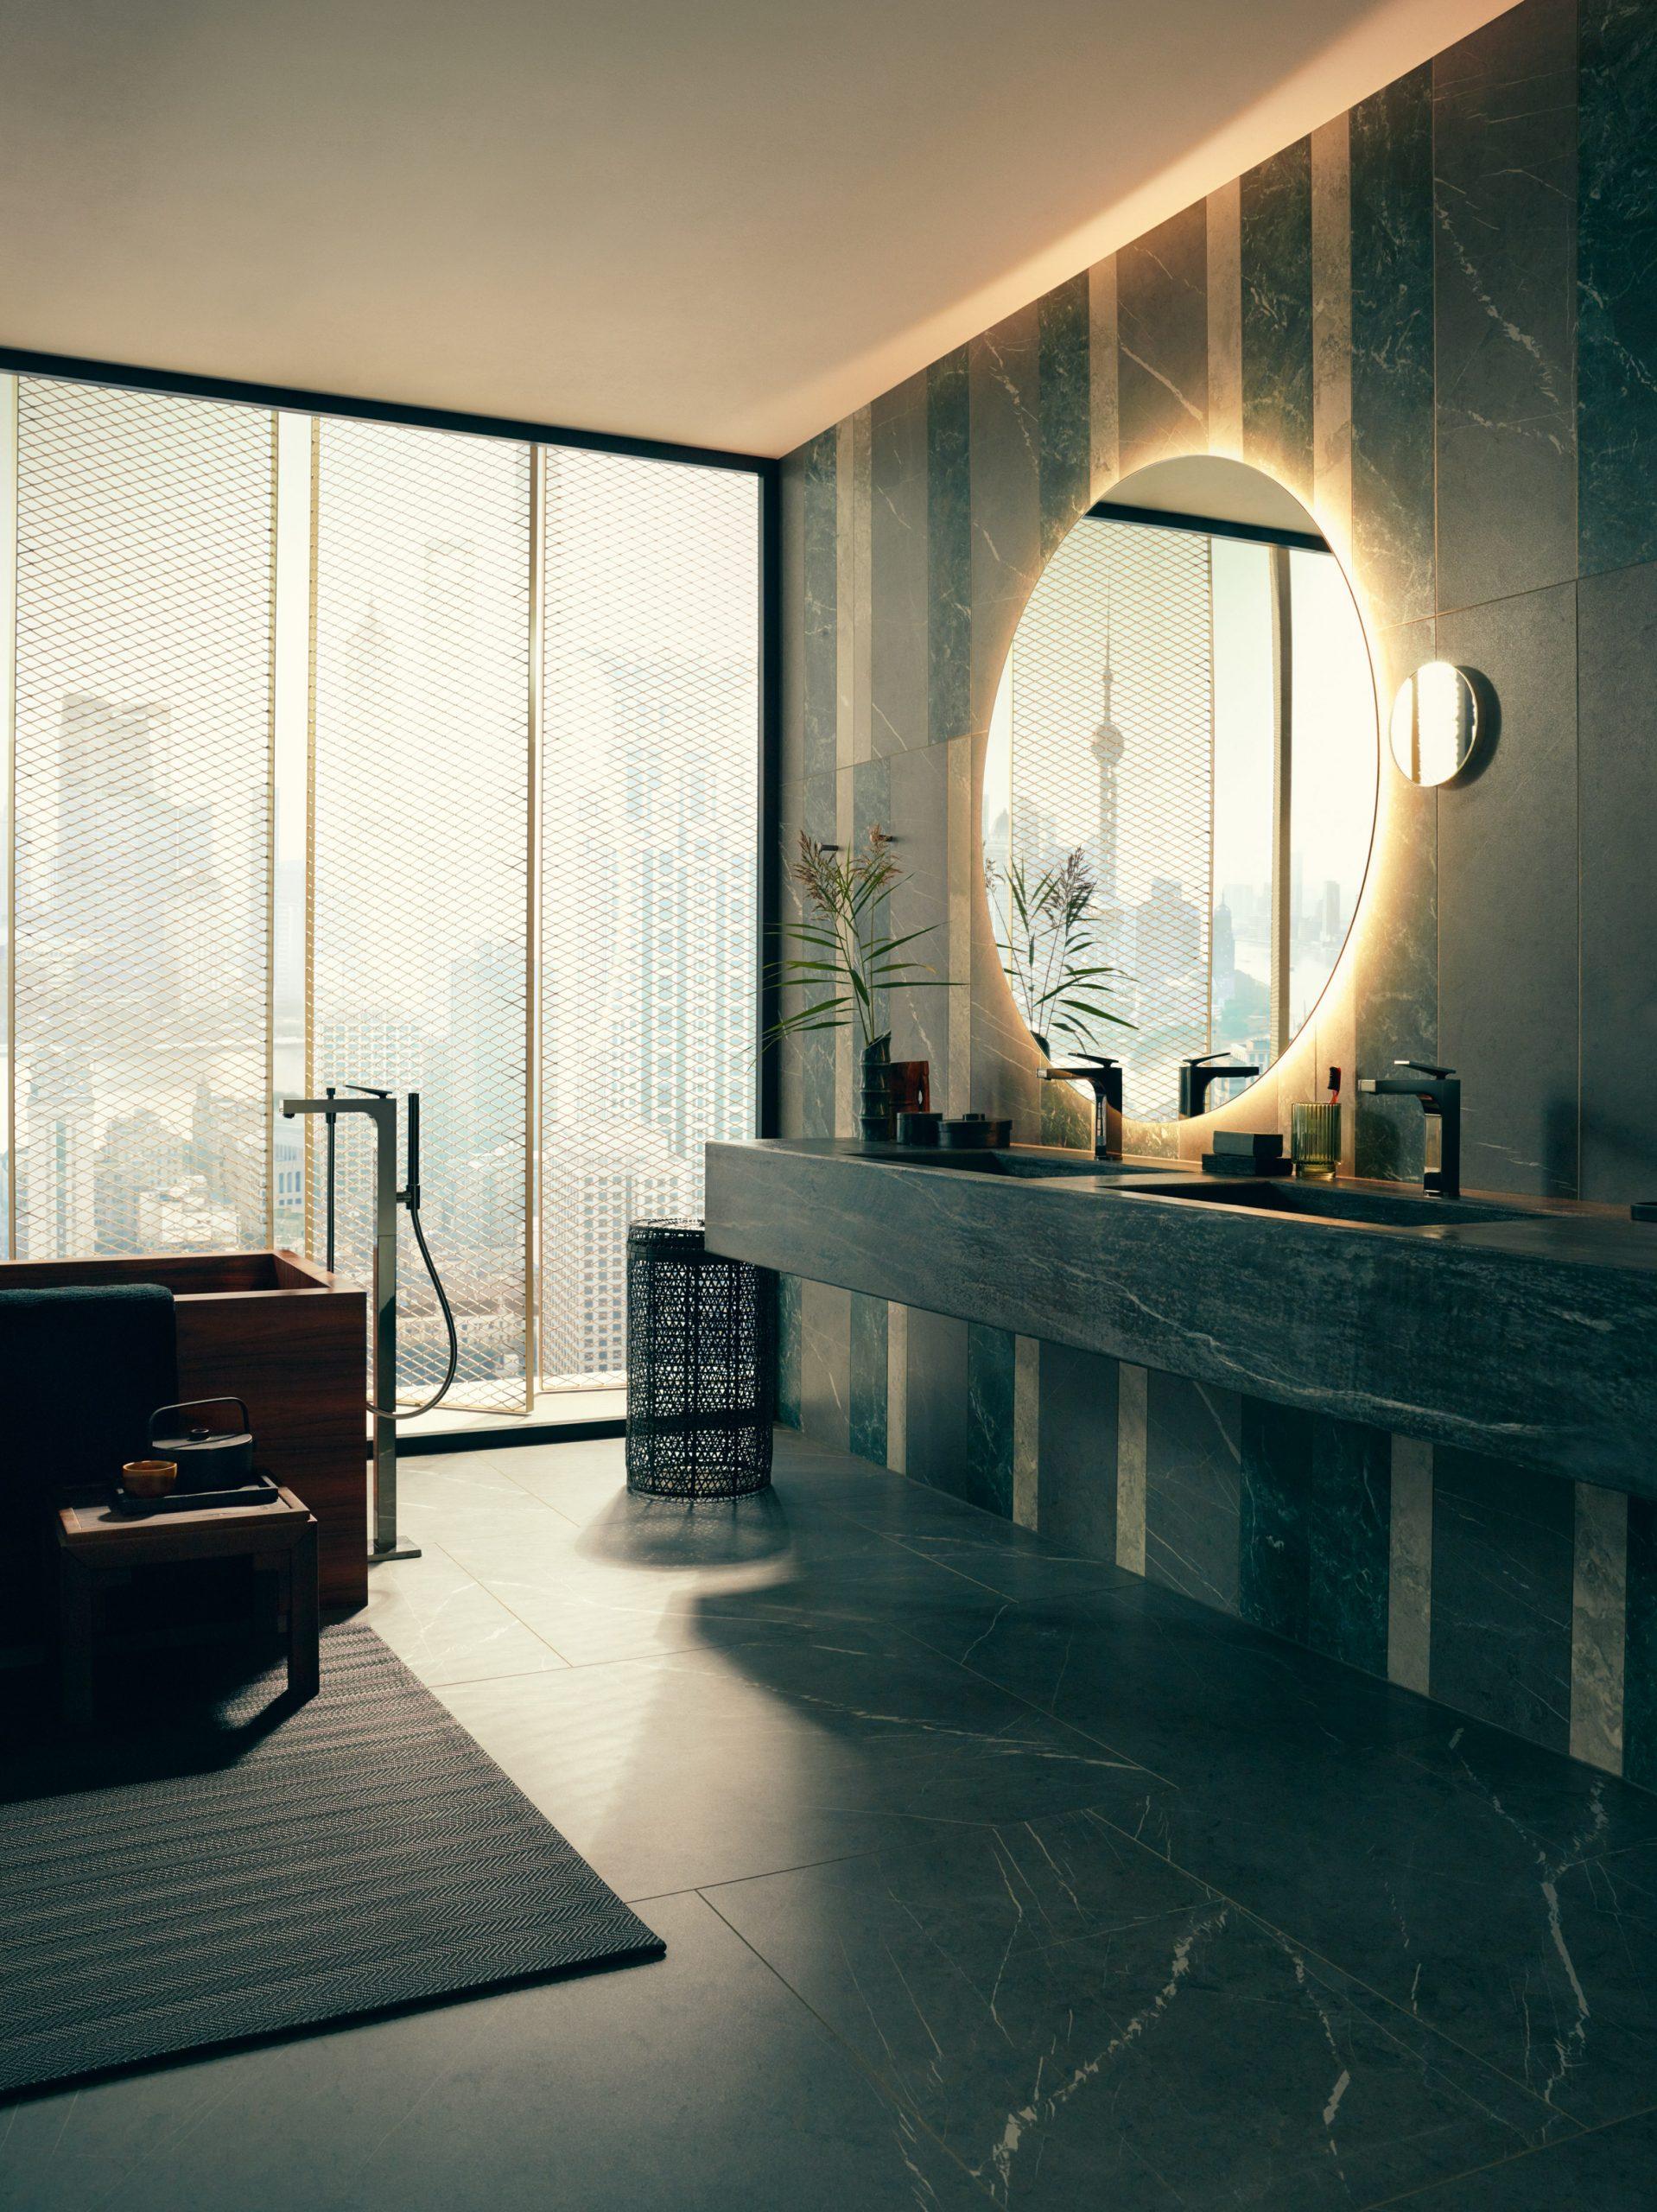 A dark stone-lined bathroom